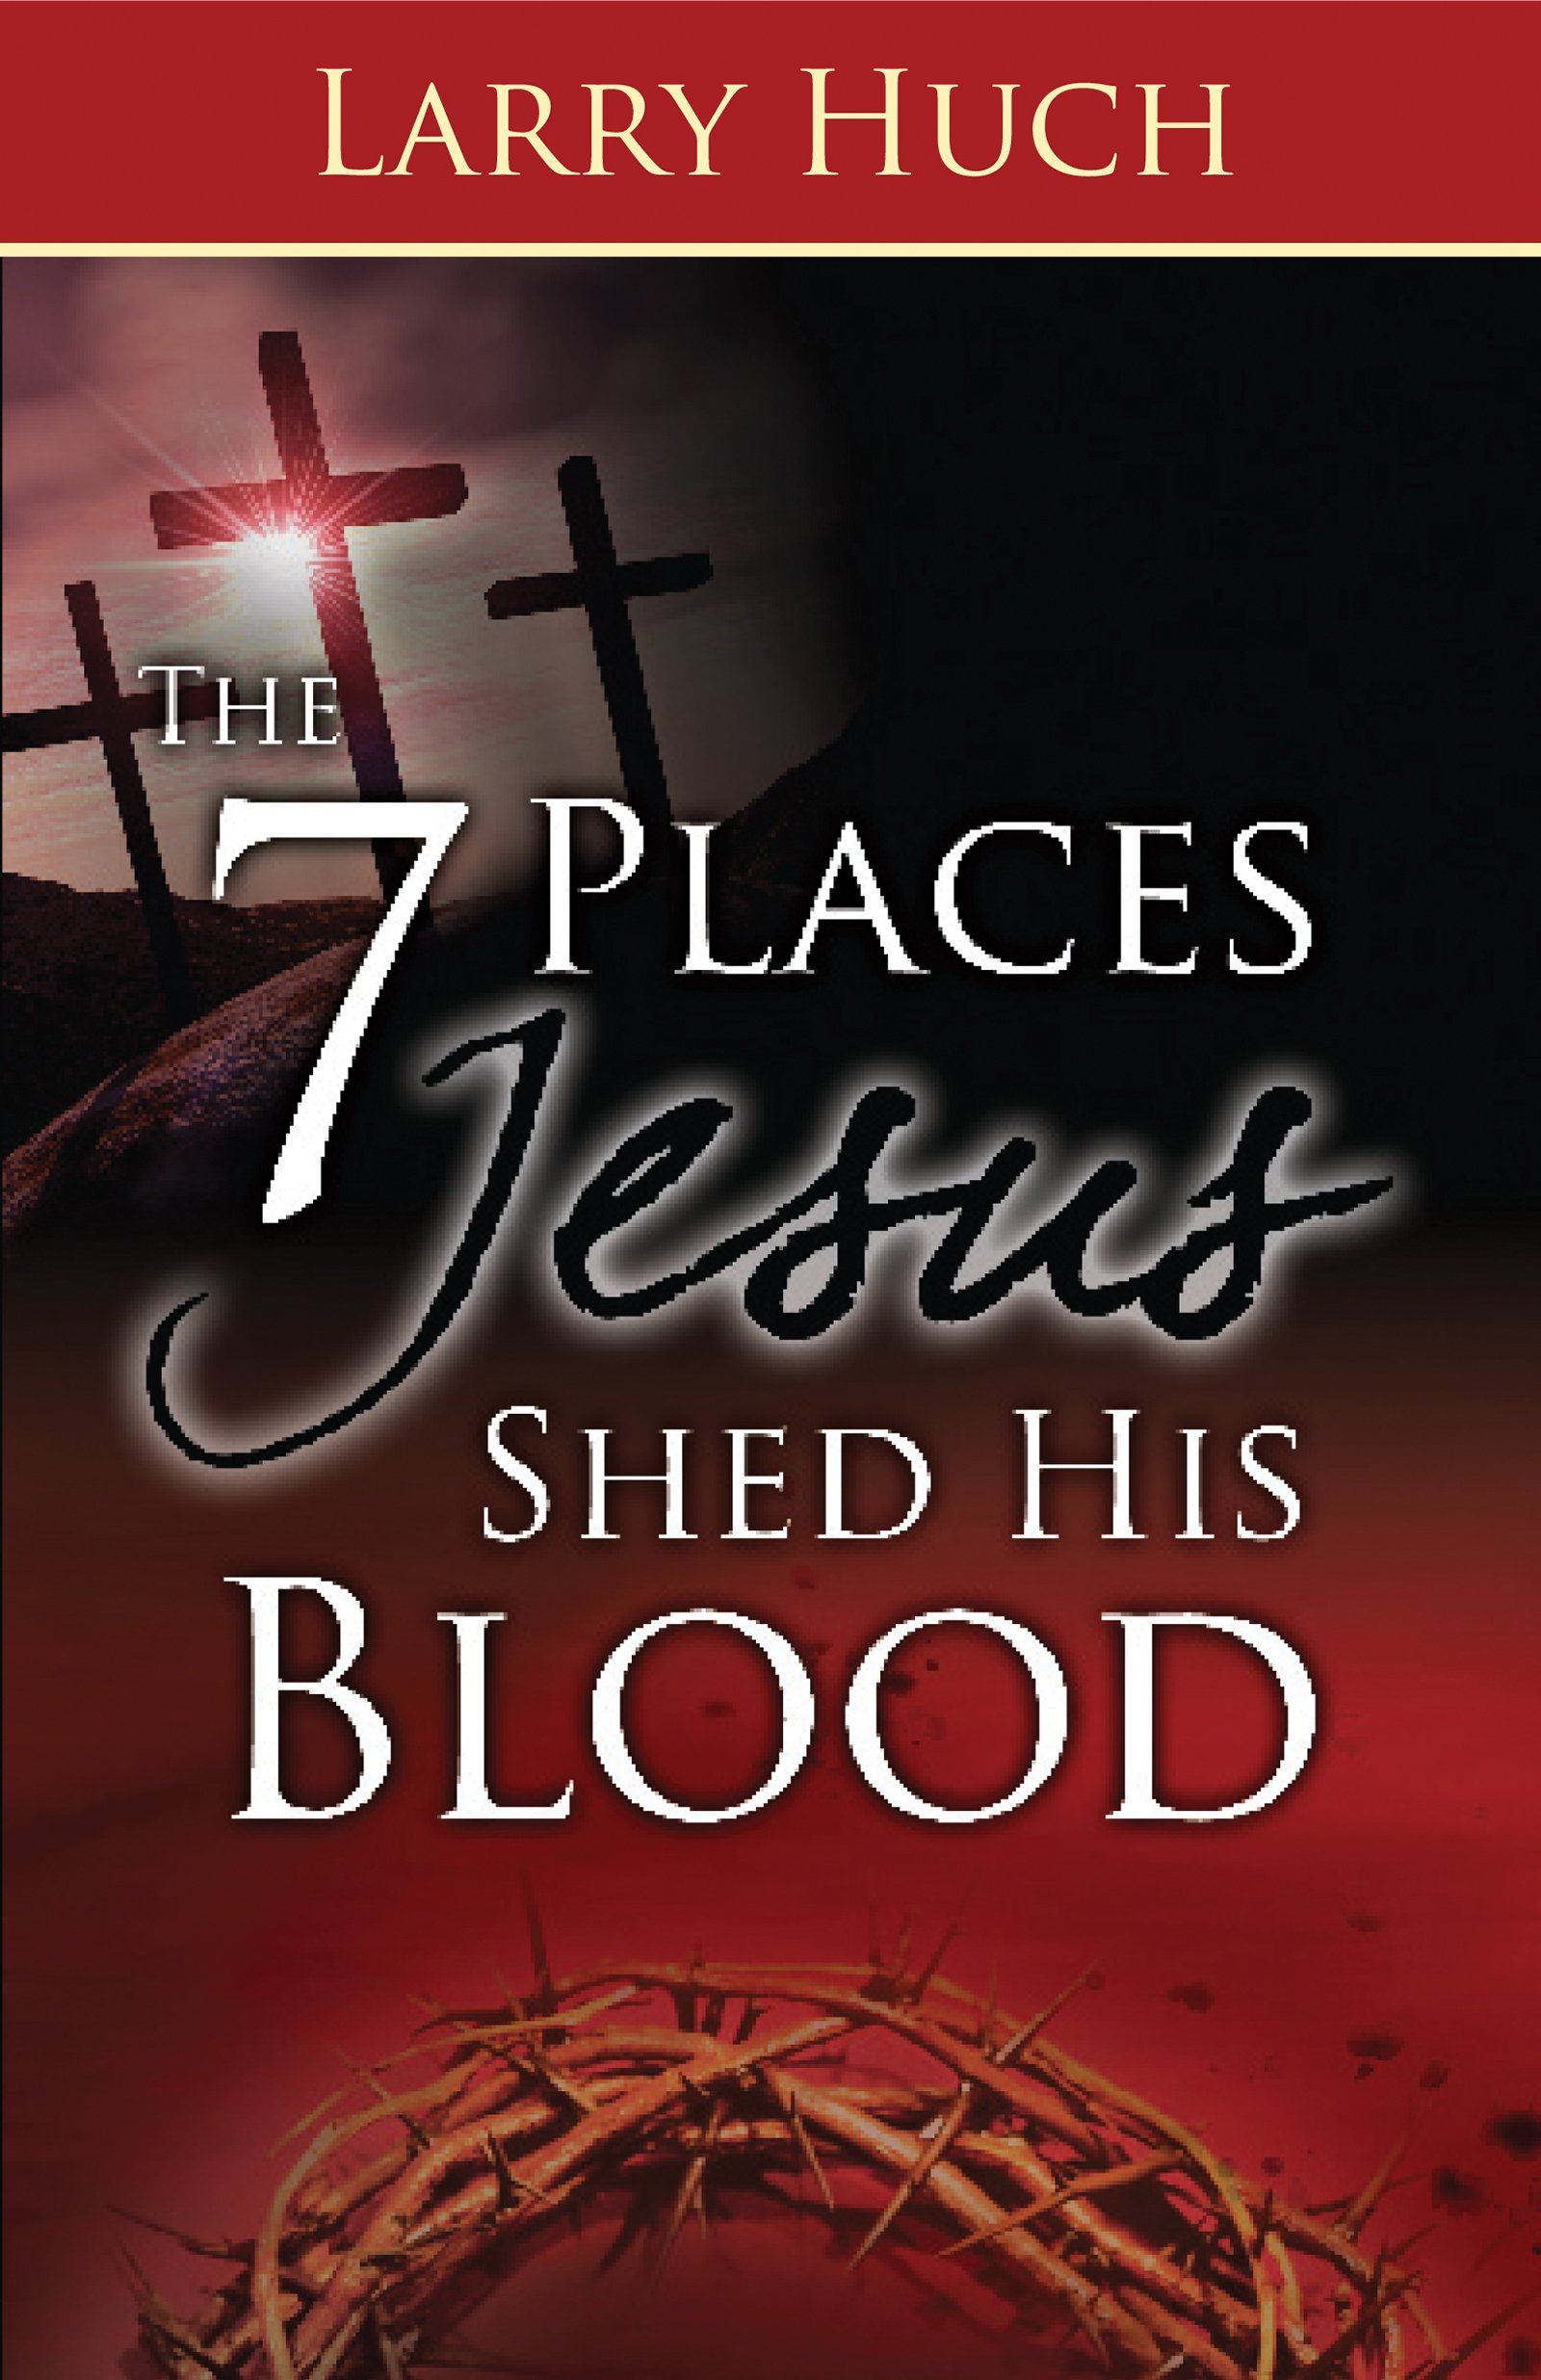 Download 7 Places Jesus Shed His Blood pdf epub